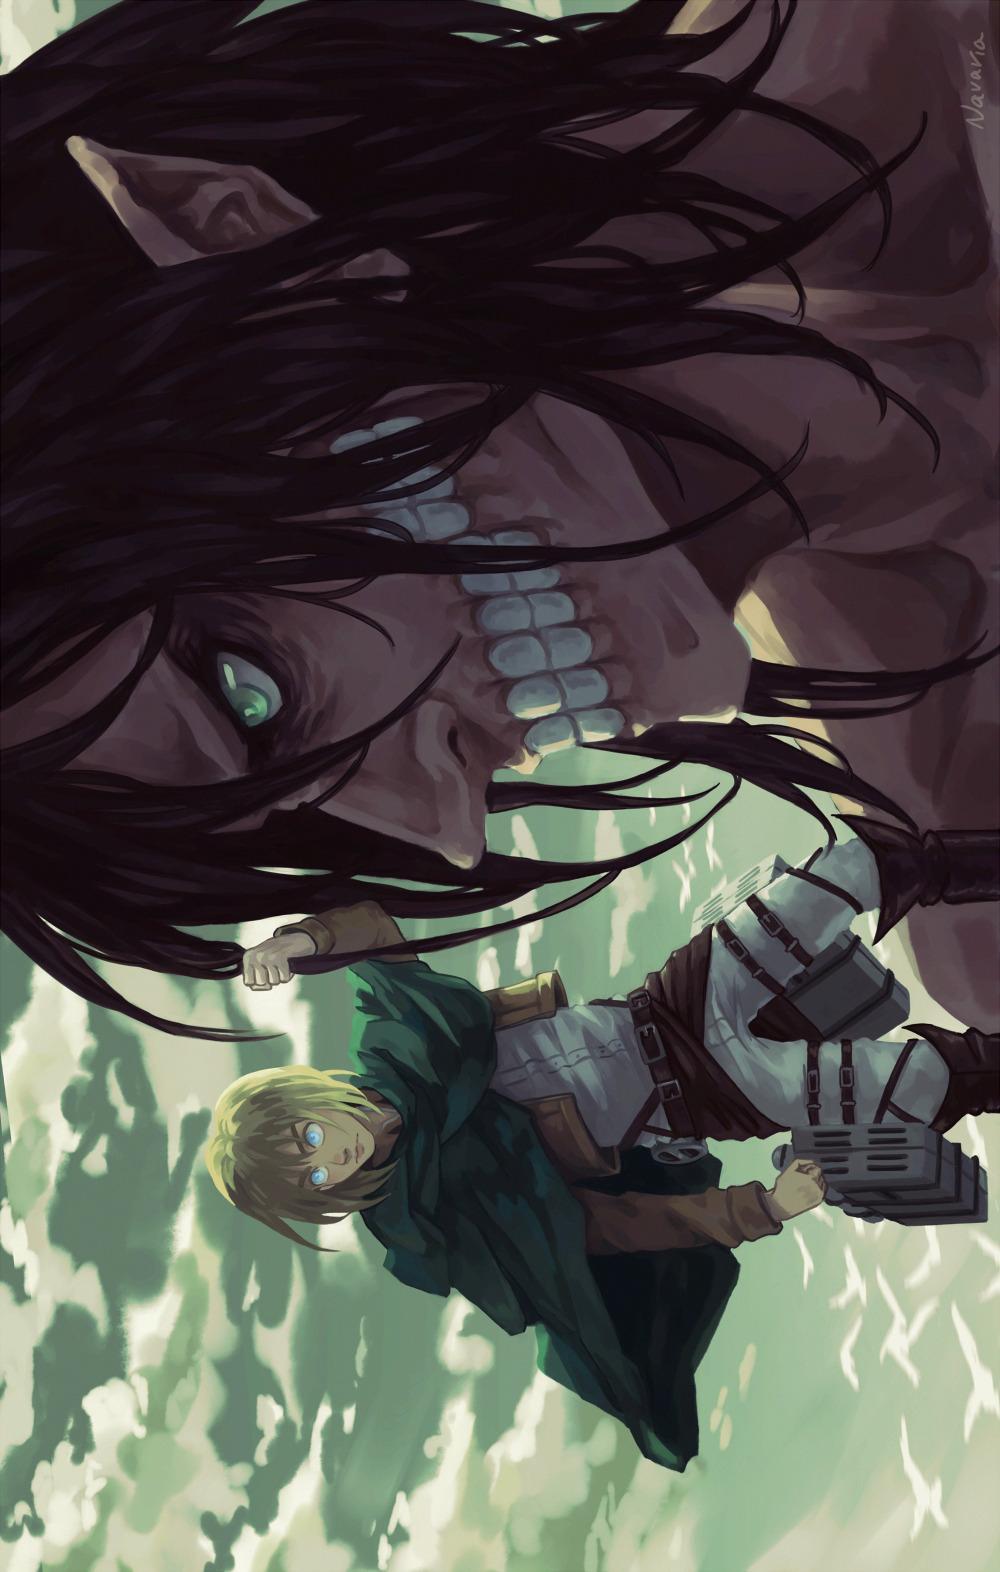 Snk Tumblr Attack On Titan Anime Attack On Titan Fanart Attack On Titan Eren